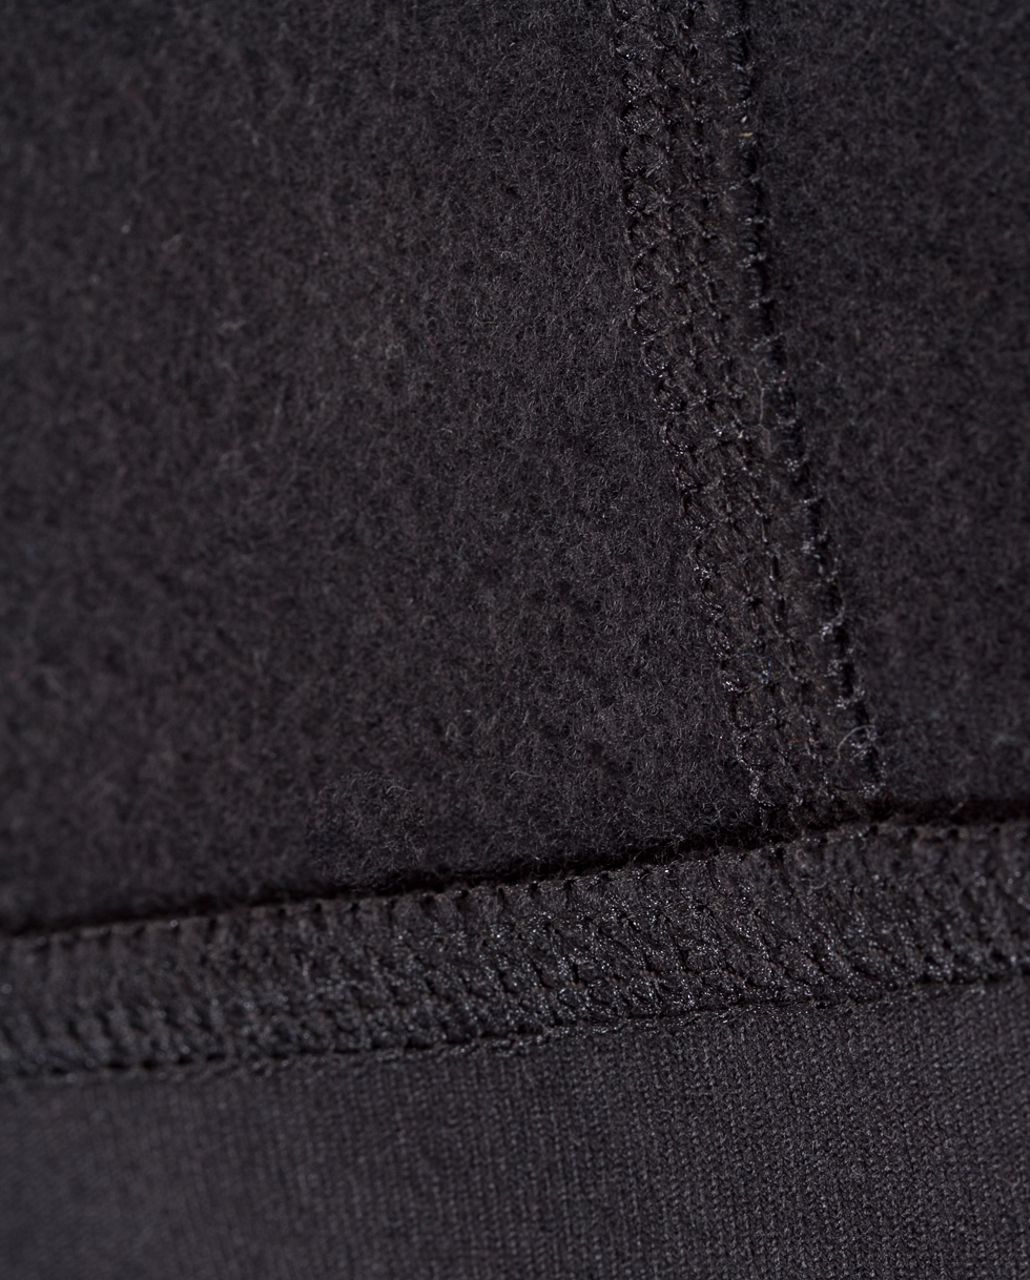 Lululemon Still Pant *Brushed (Regular) - Black